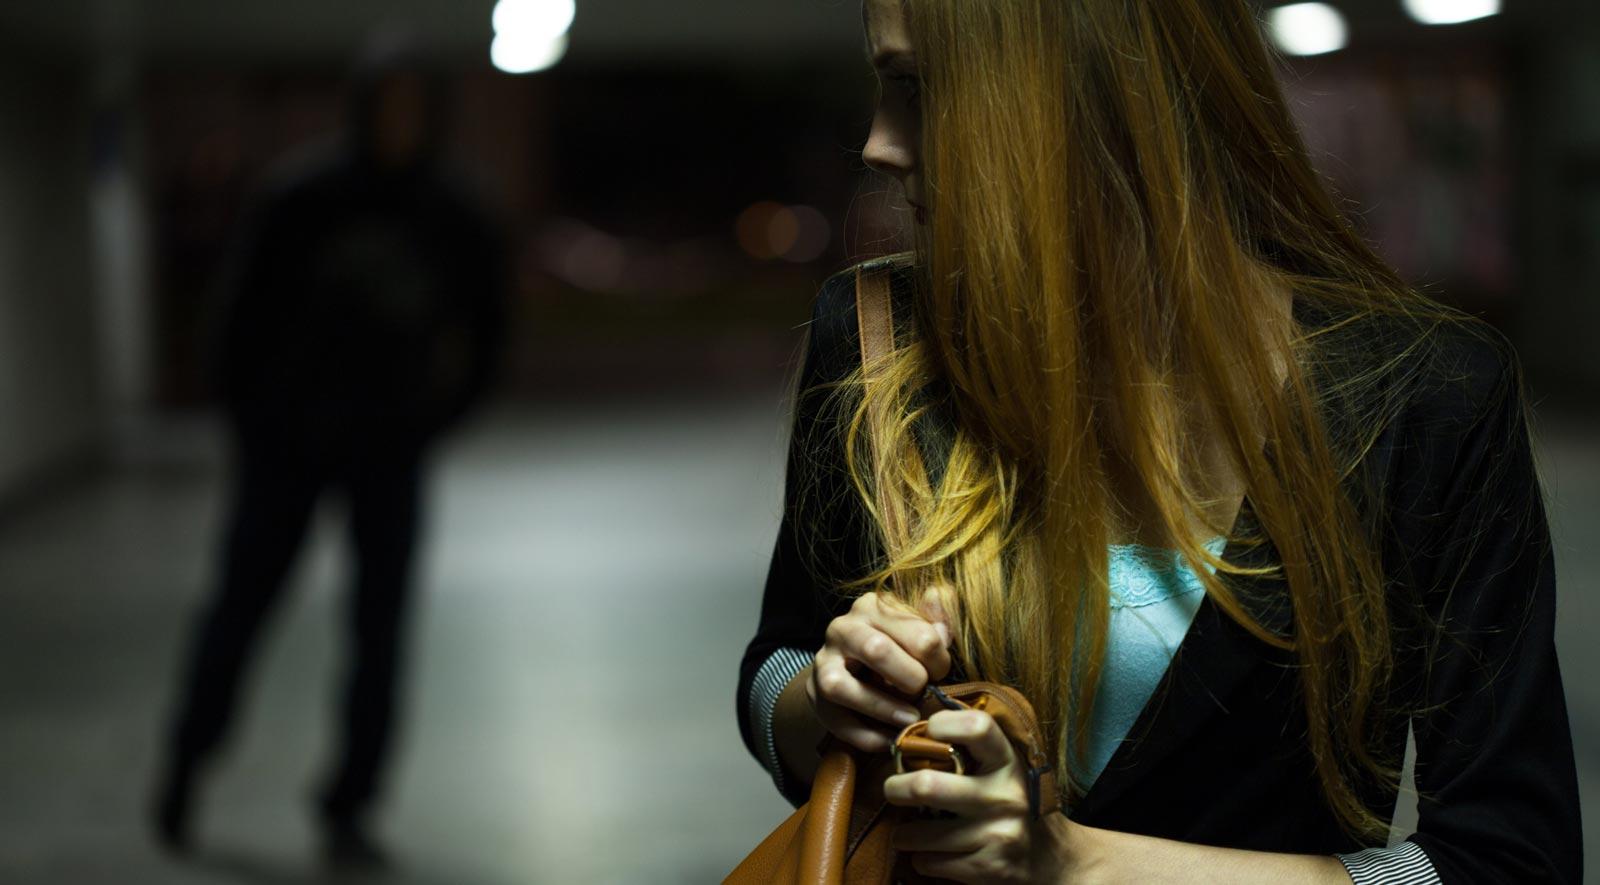 Are Expandable Batons a Good Self-Defense Tool